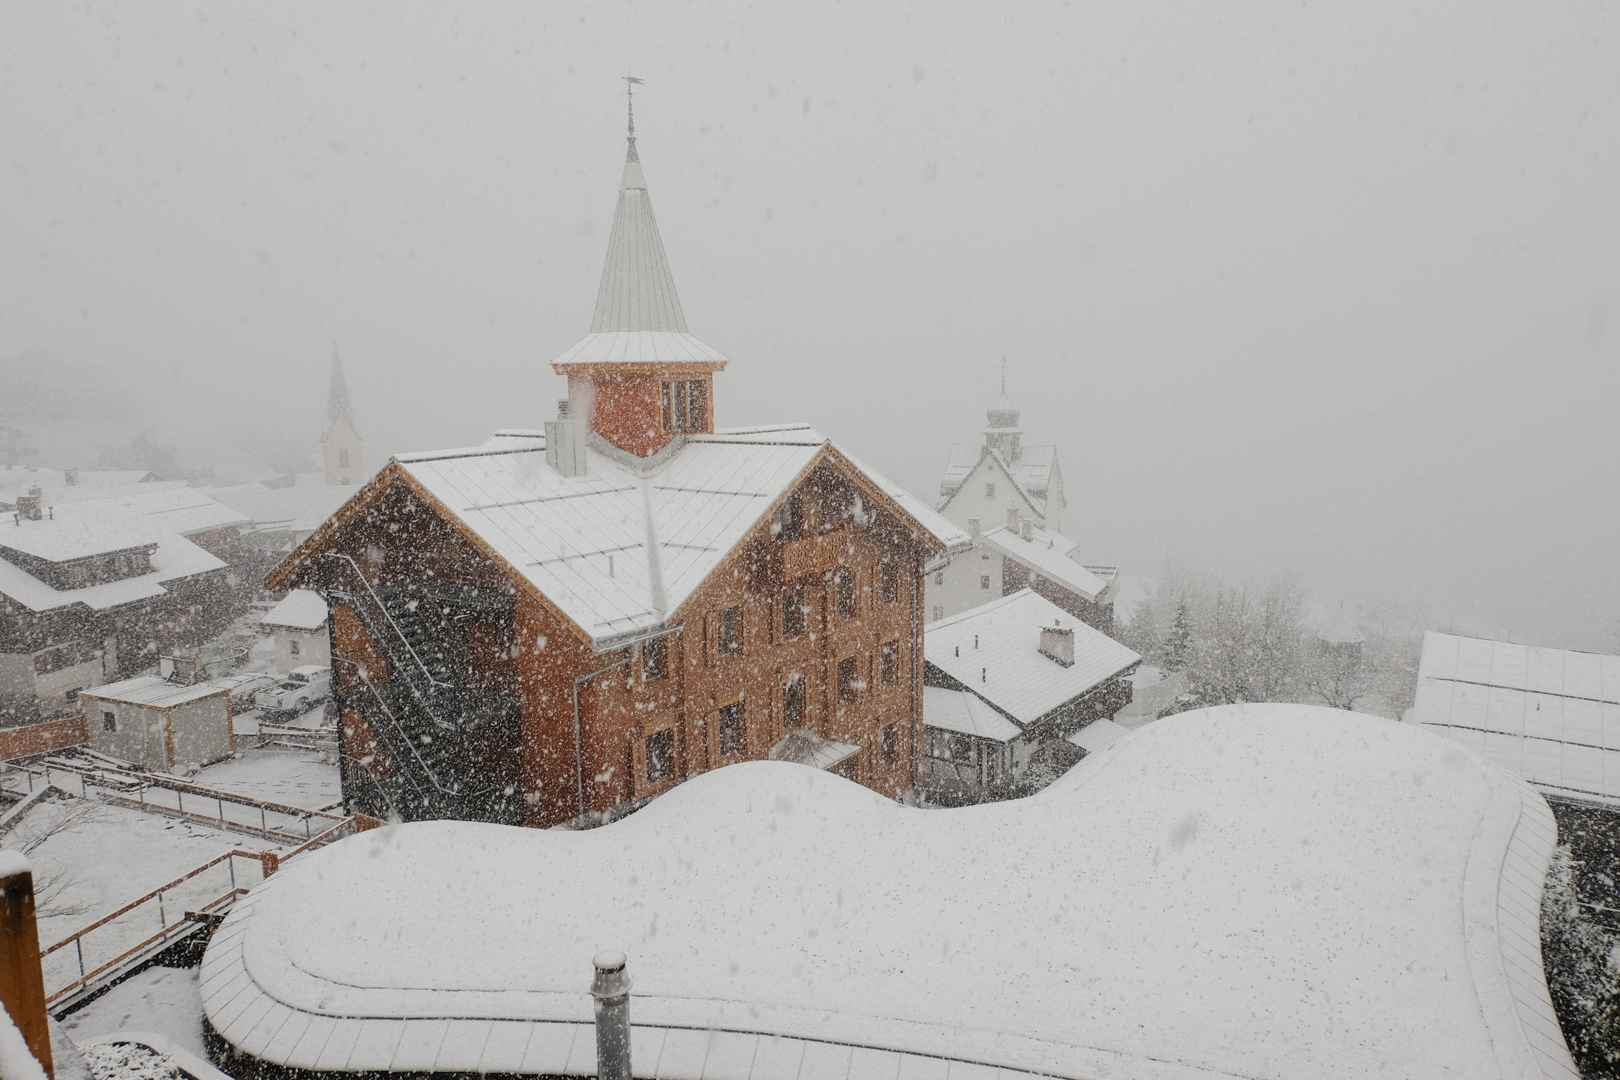 Schneegestöber in Morissen